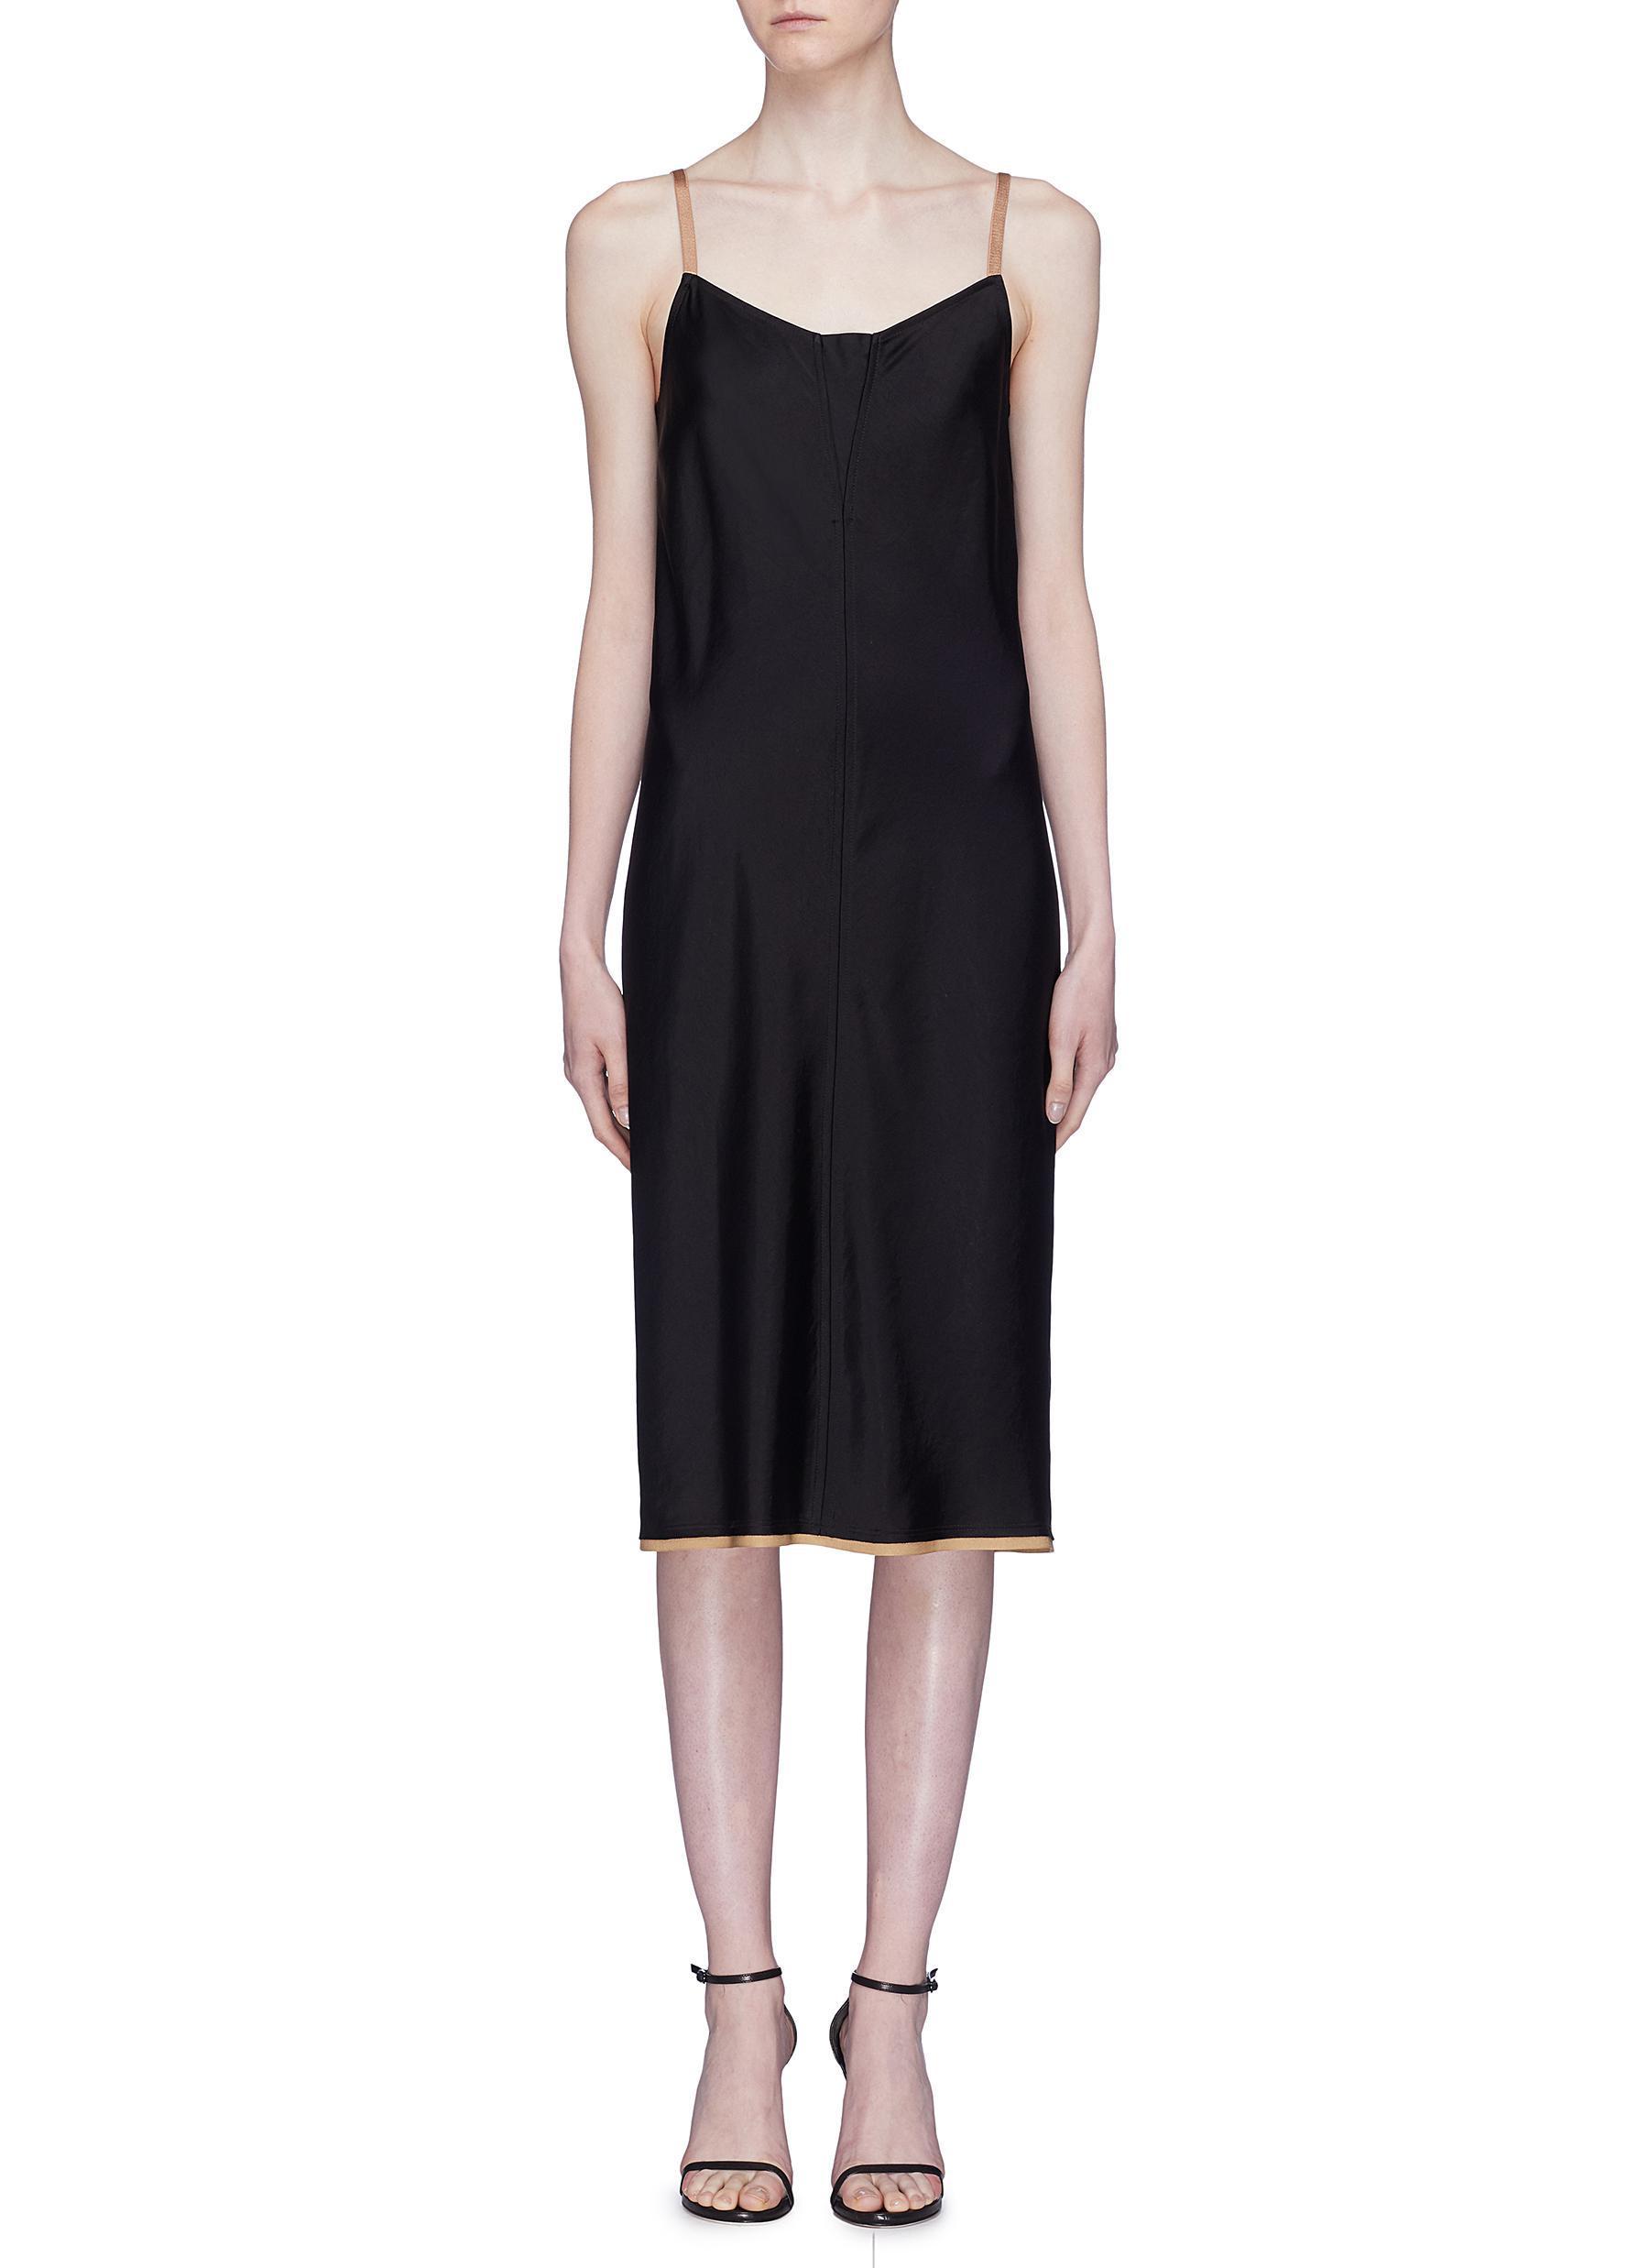 10b6c5844f52 T By Alexander Wang 'wash & Go' Contrast Trim Satin Slip Dress in ...